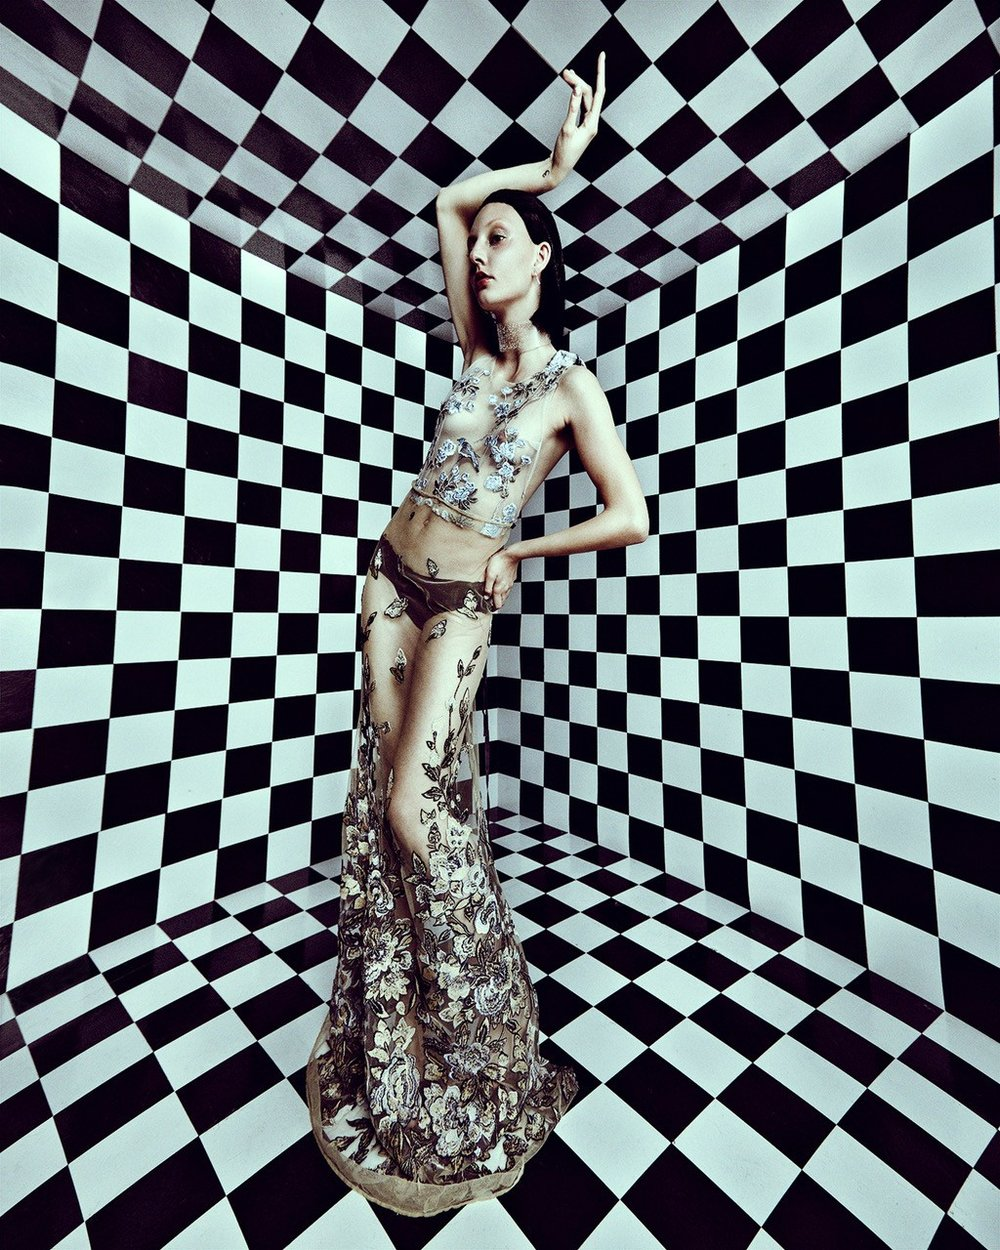 http://www.kingkongmagazine.com/fashion/cartesian/ #KINGKONGMAGAZINE